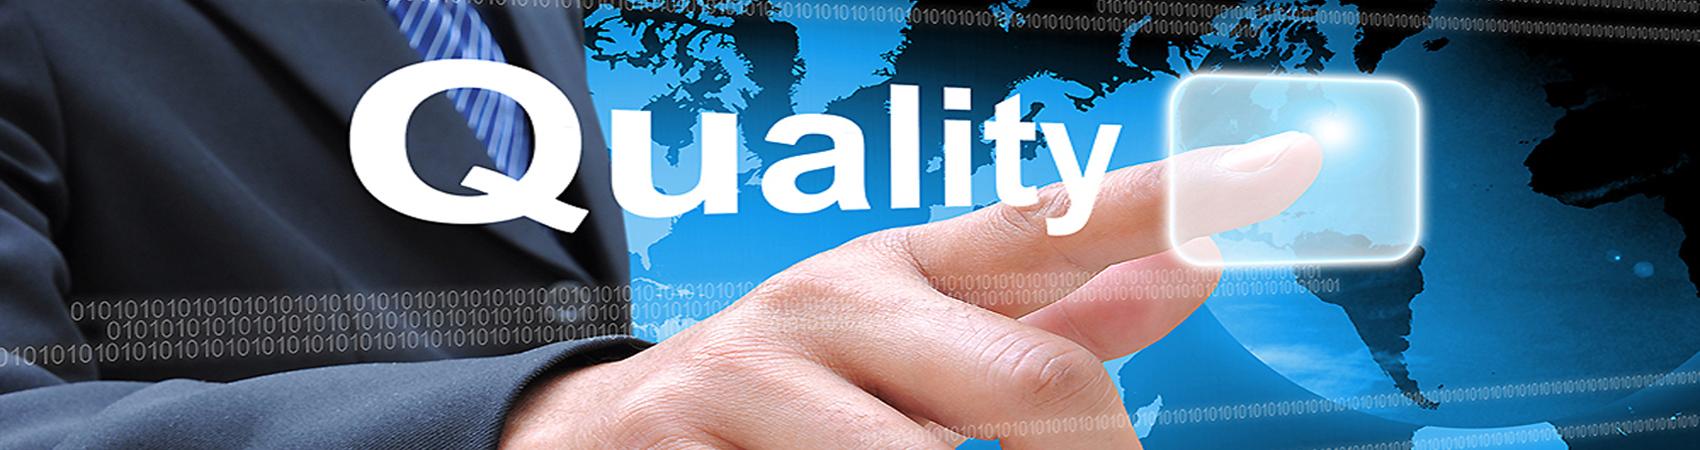 Quality Assurance & Testing